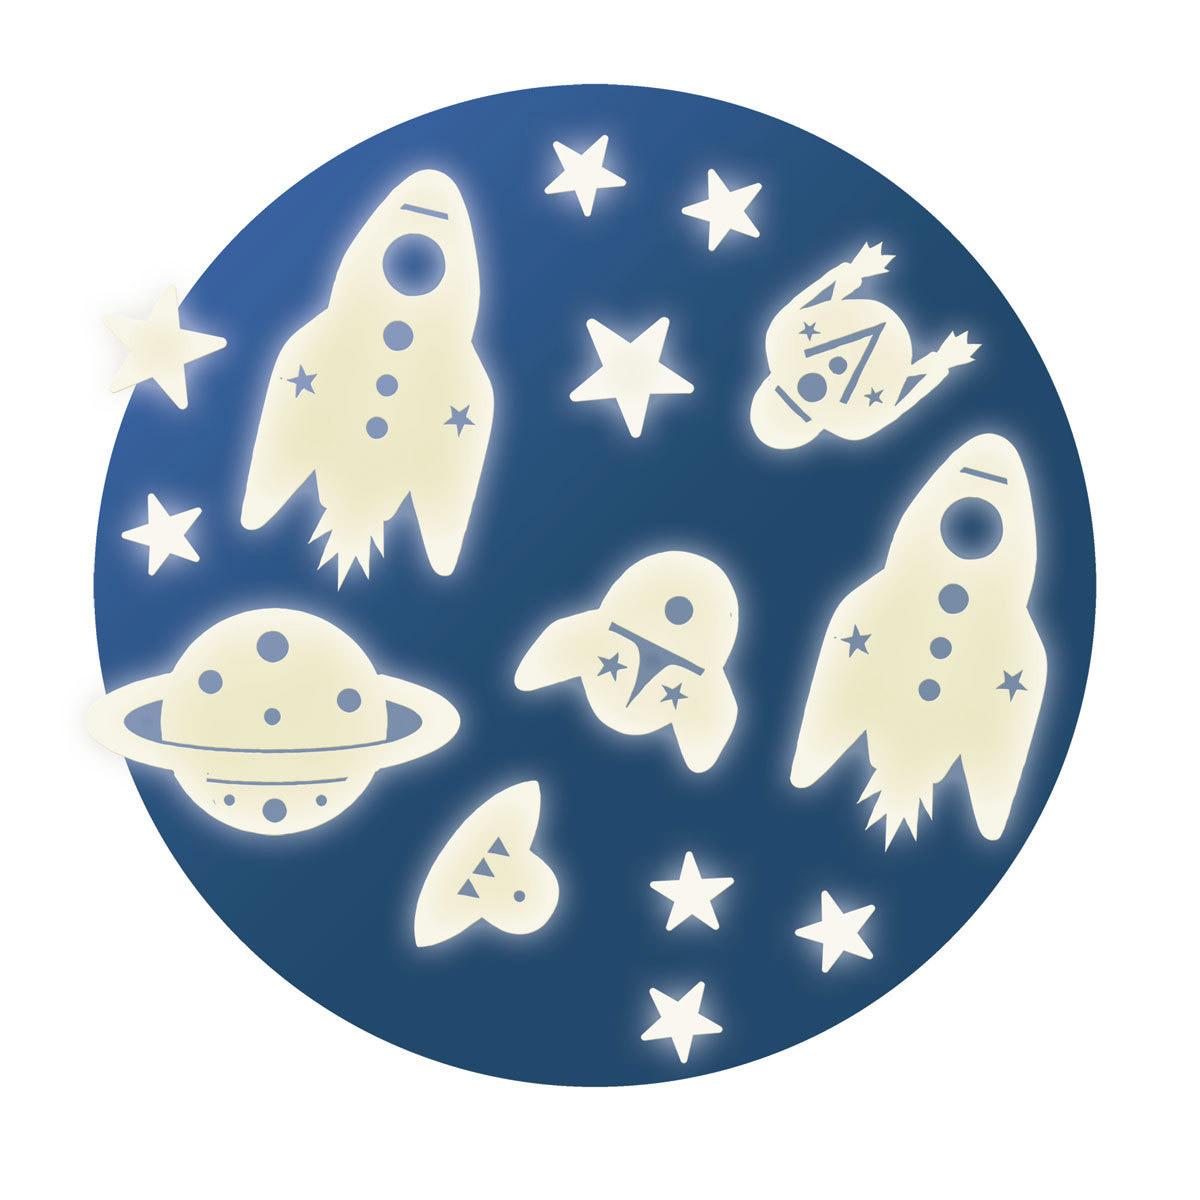 Sticker Mission Espace - Stickers Phosphorescents Mission Espace - Stickers Phosphorescents